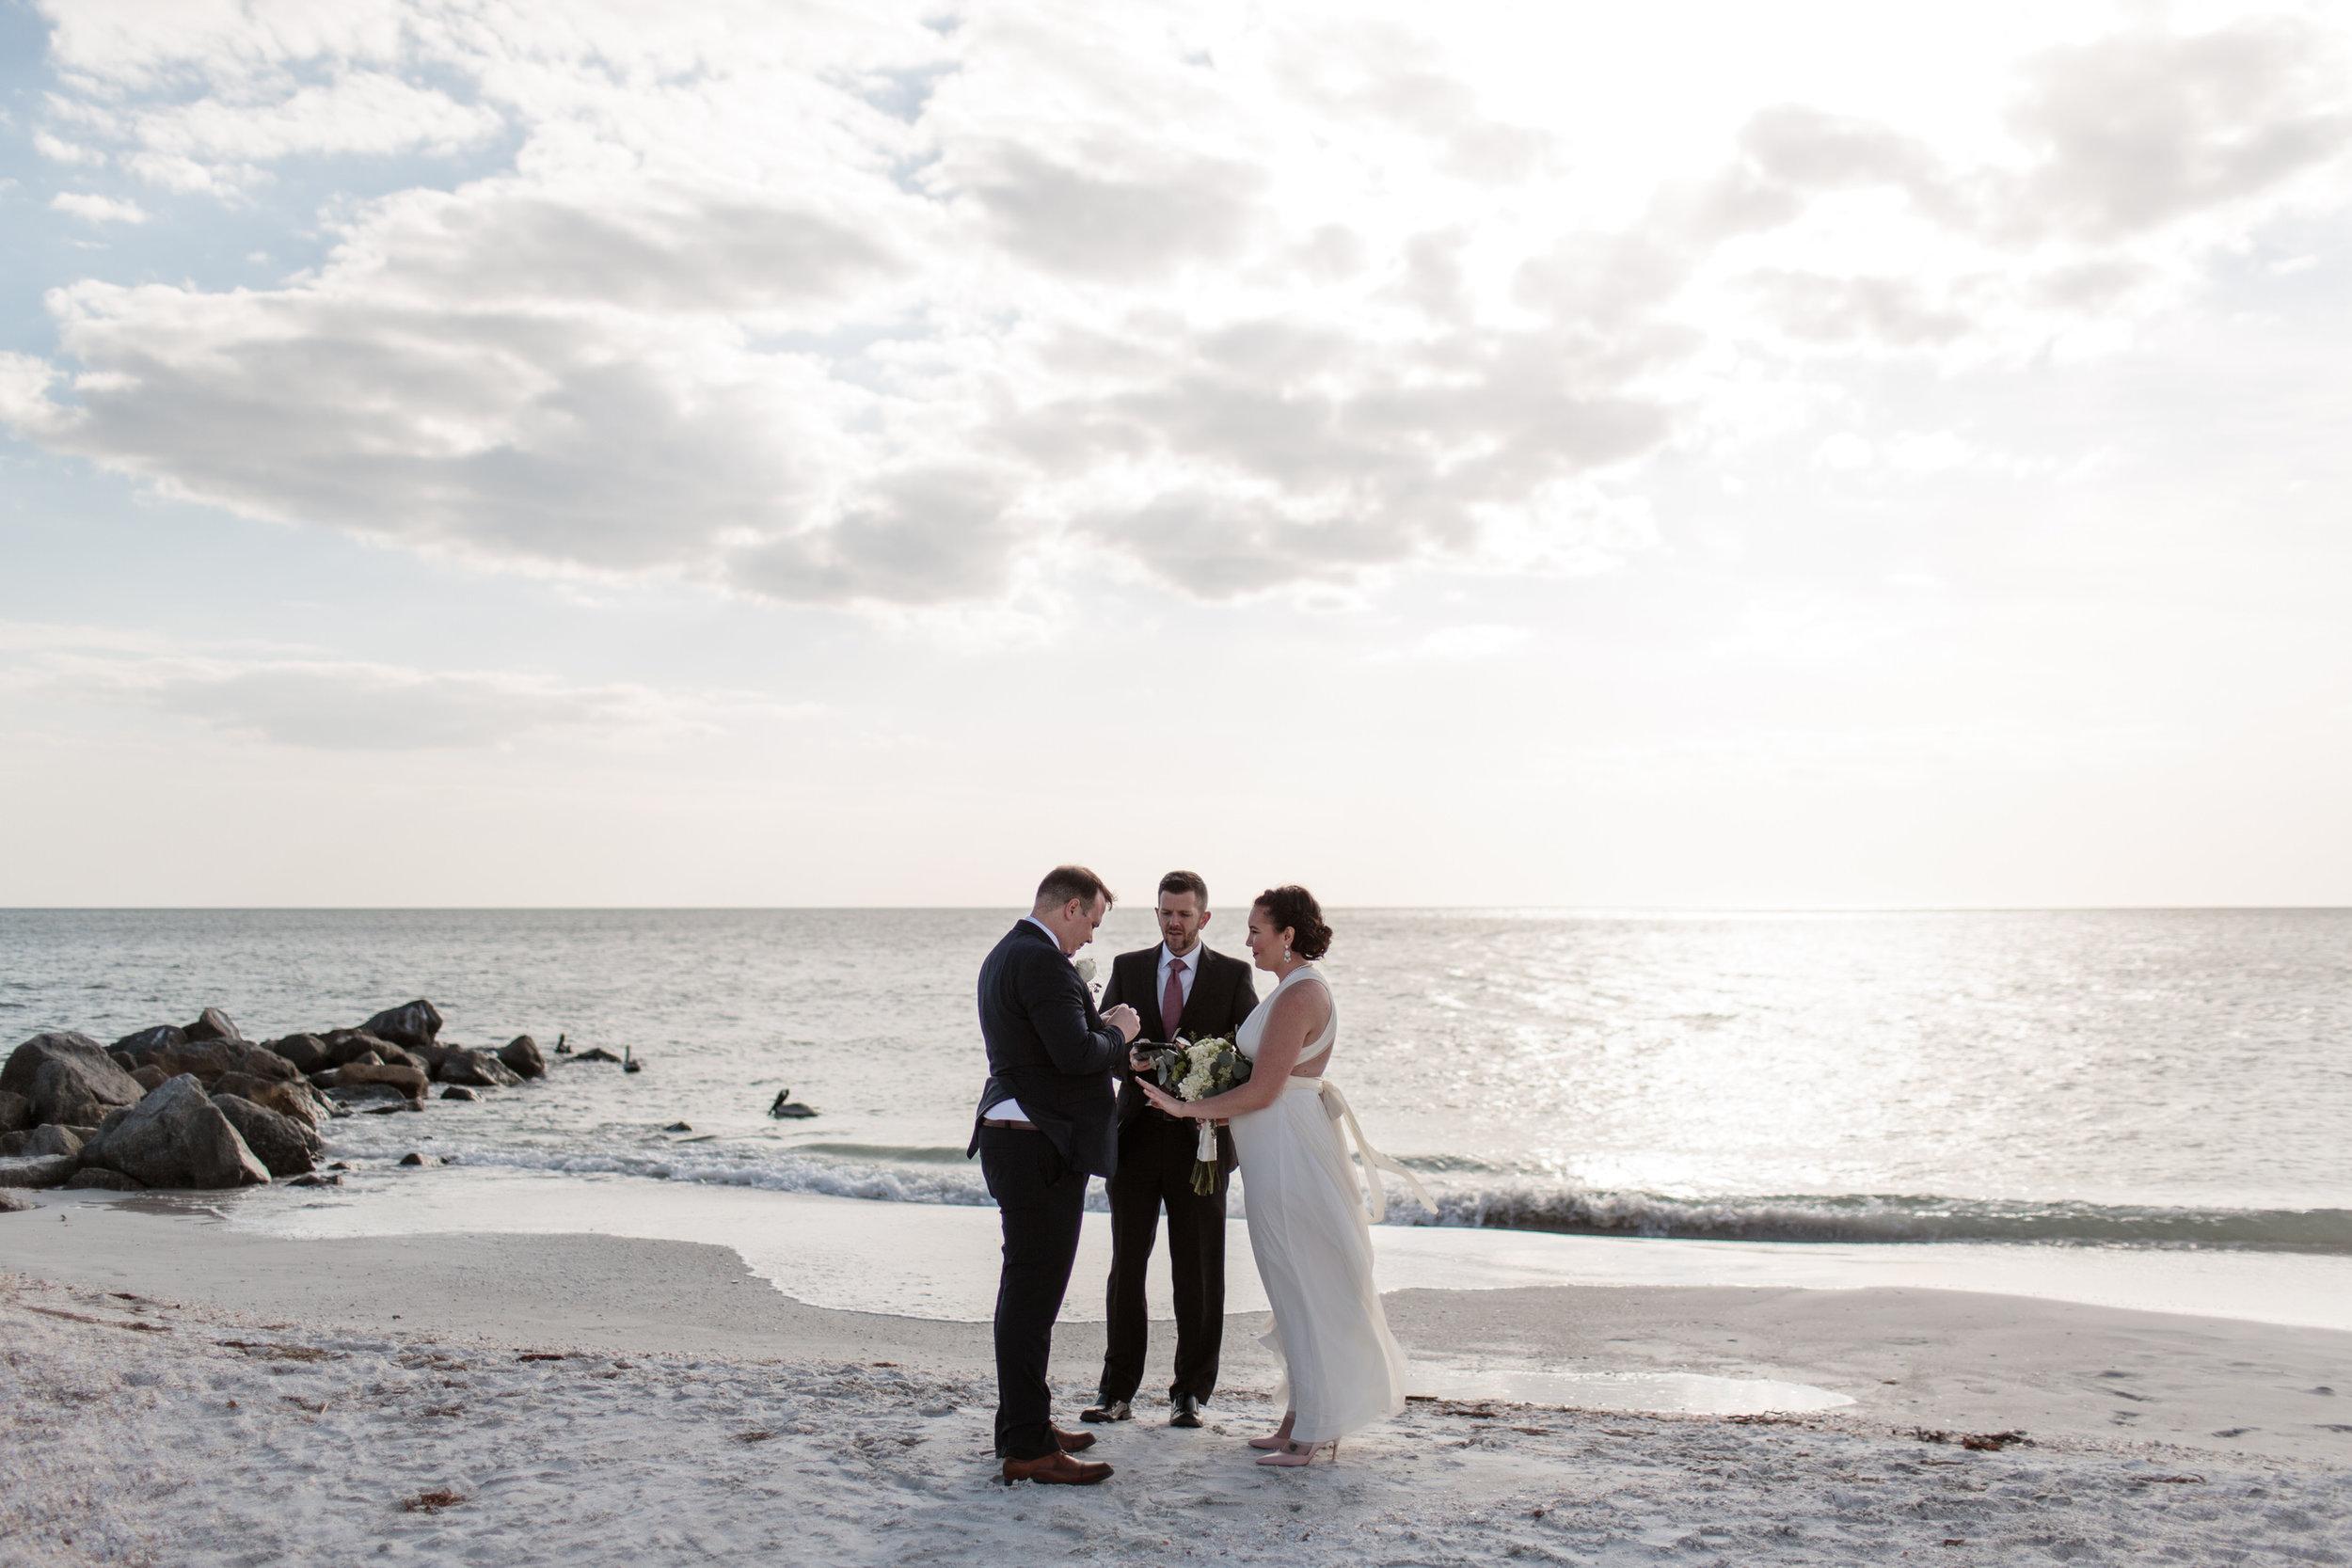 Beltran_Treasure_Island_Elopement_Tampa_Wedding_017-1.jpg